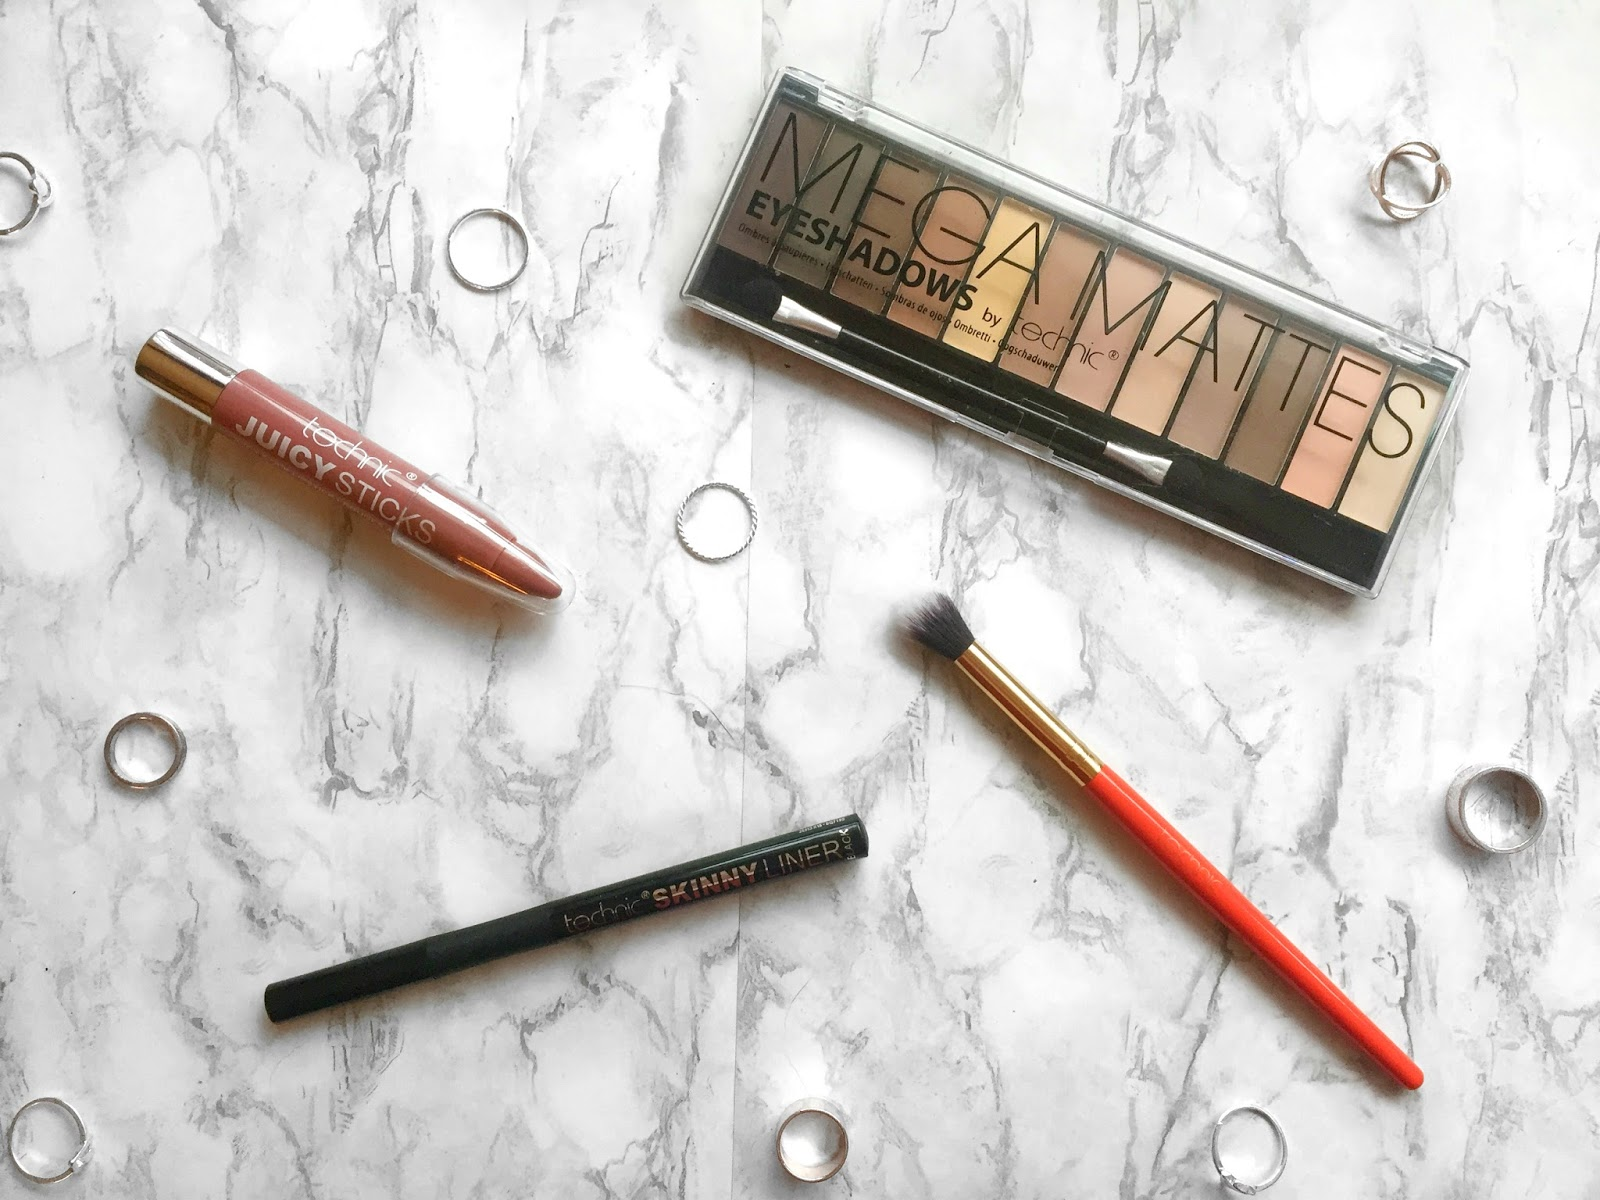 Everyday Basics from Technic including Nude Eyeshadow Palette, Felt Liquid Liner Pen, Jumbo Lip Crayon and Eyeshadow Blending Brush.